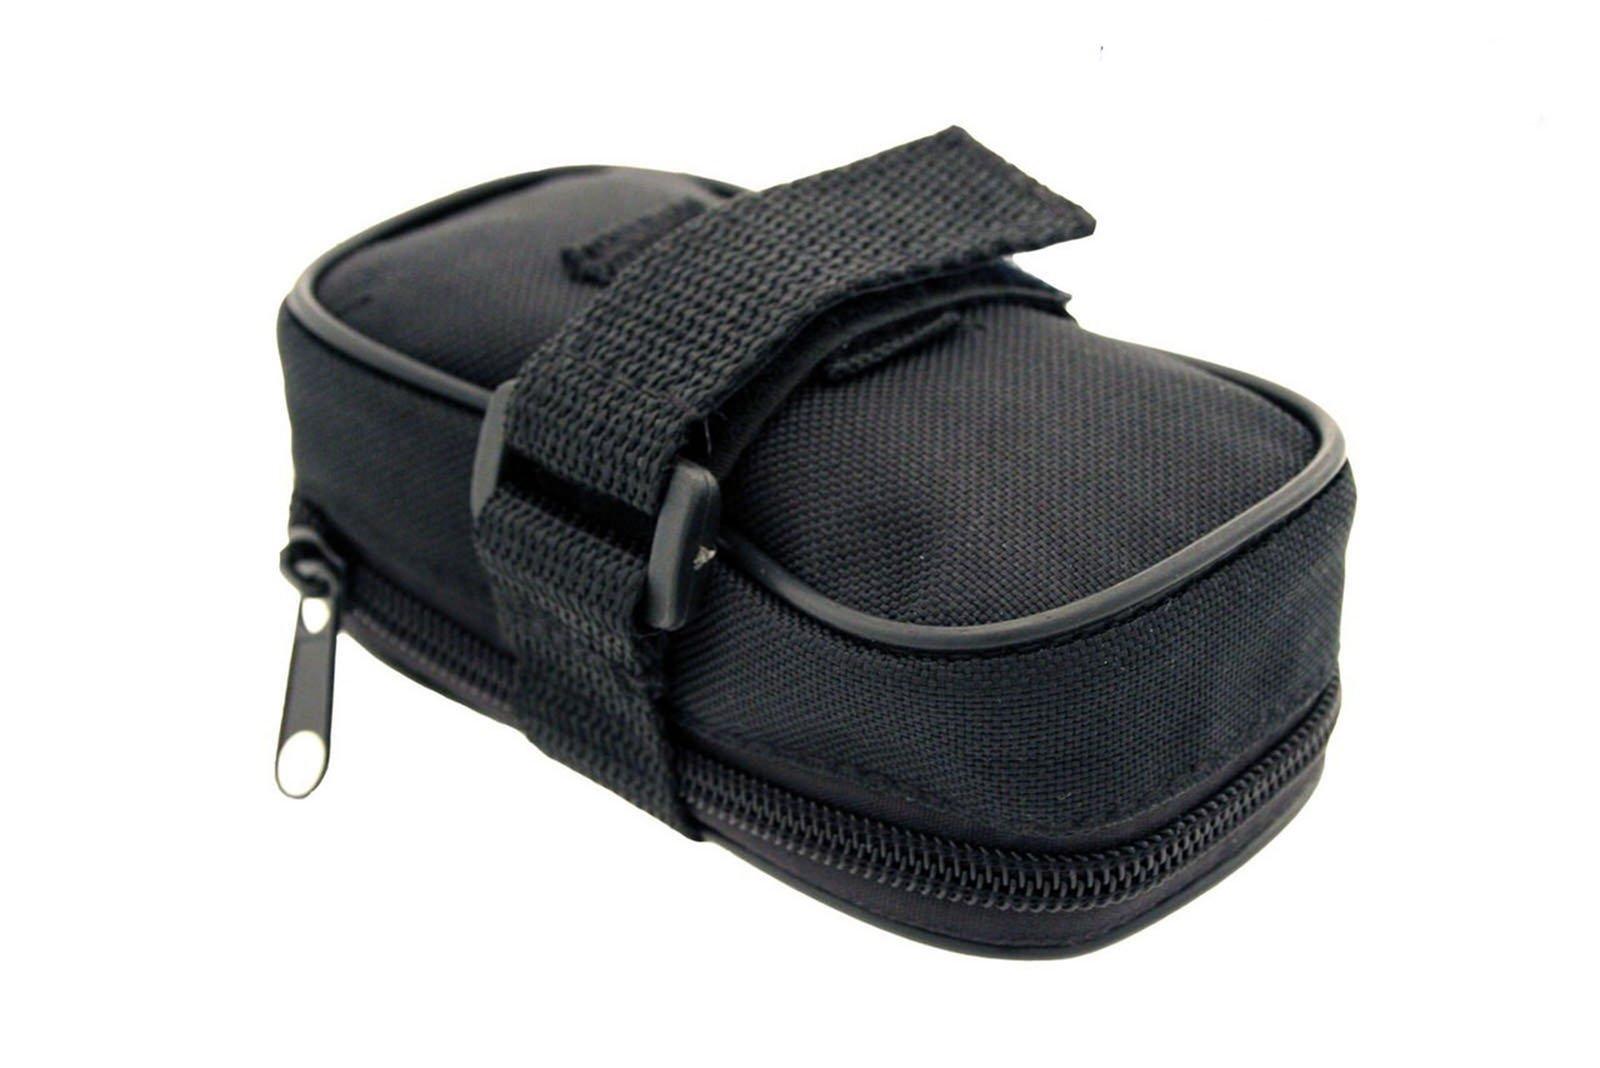 Bolsa Bajo Sillin Impermeable Porta Camaras o herramientas para ...